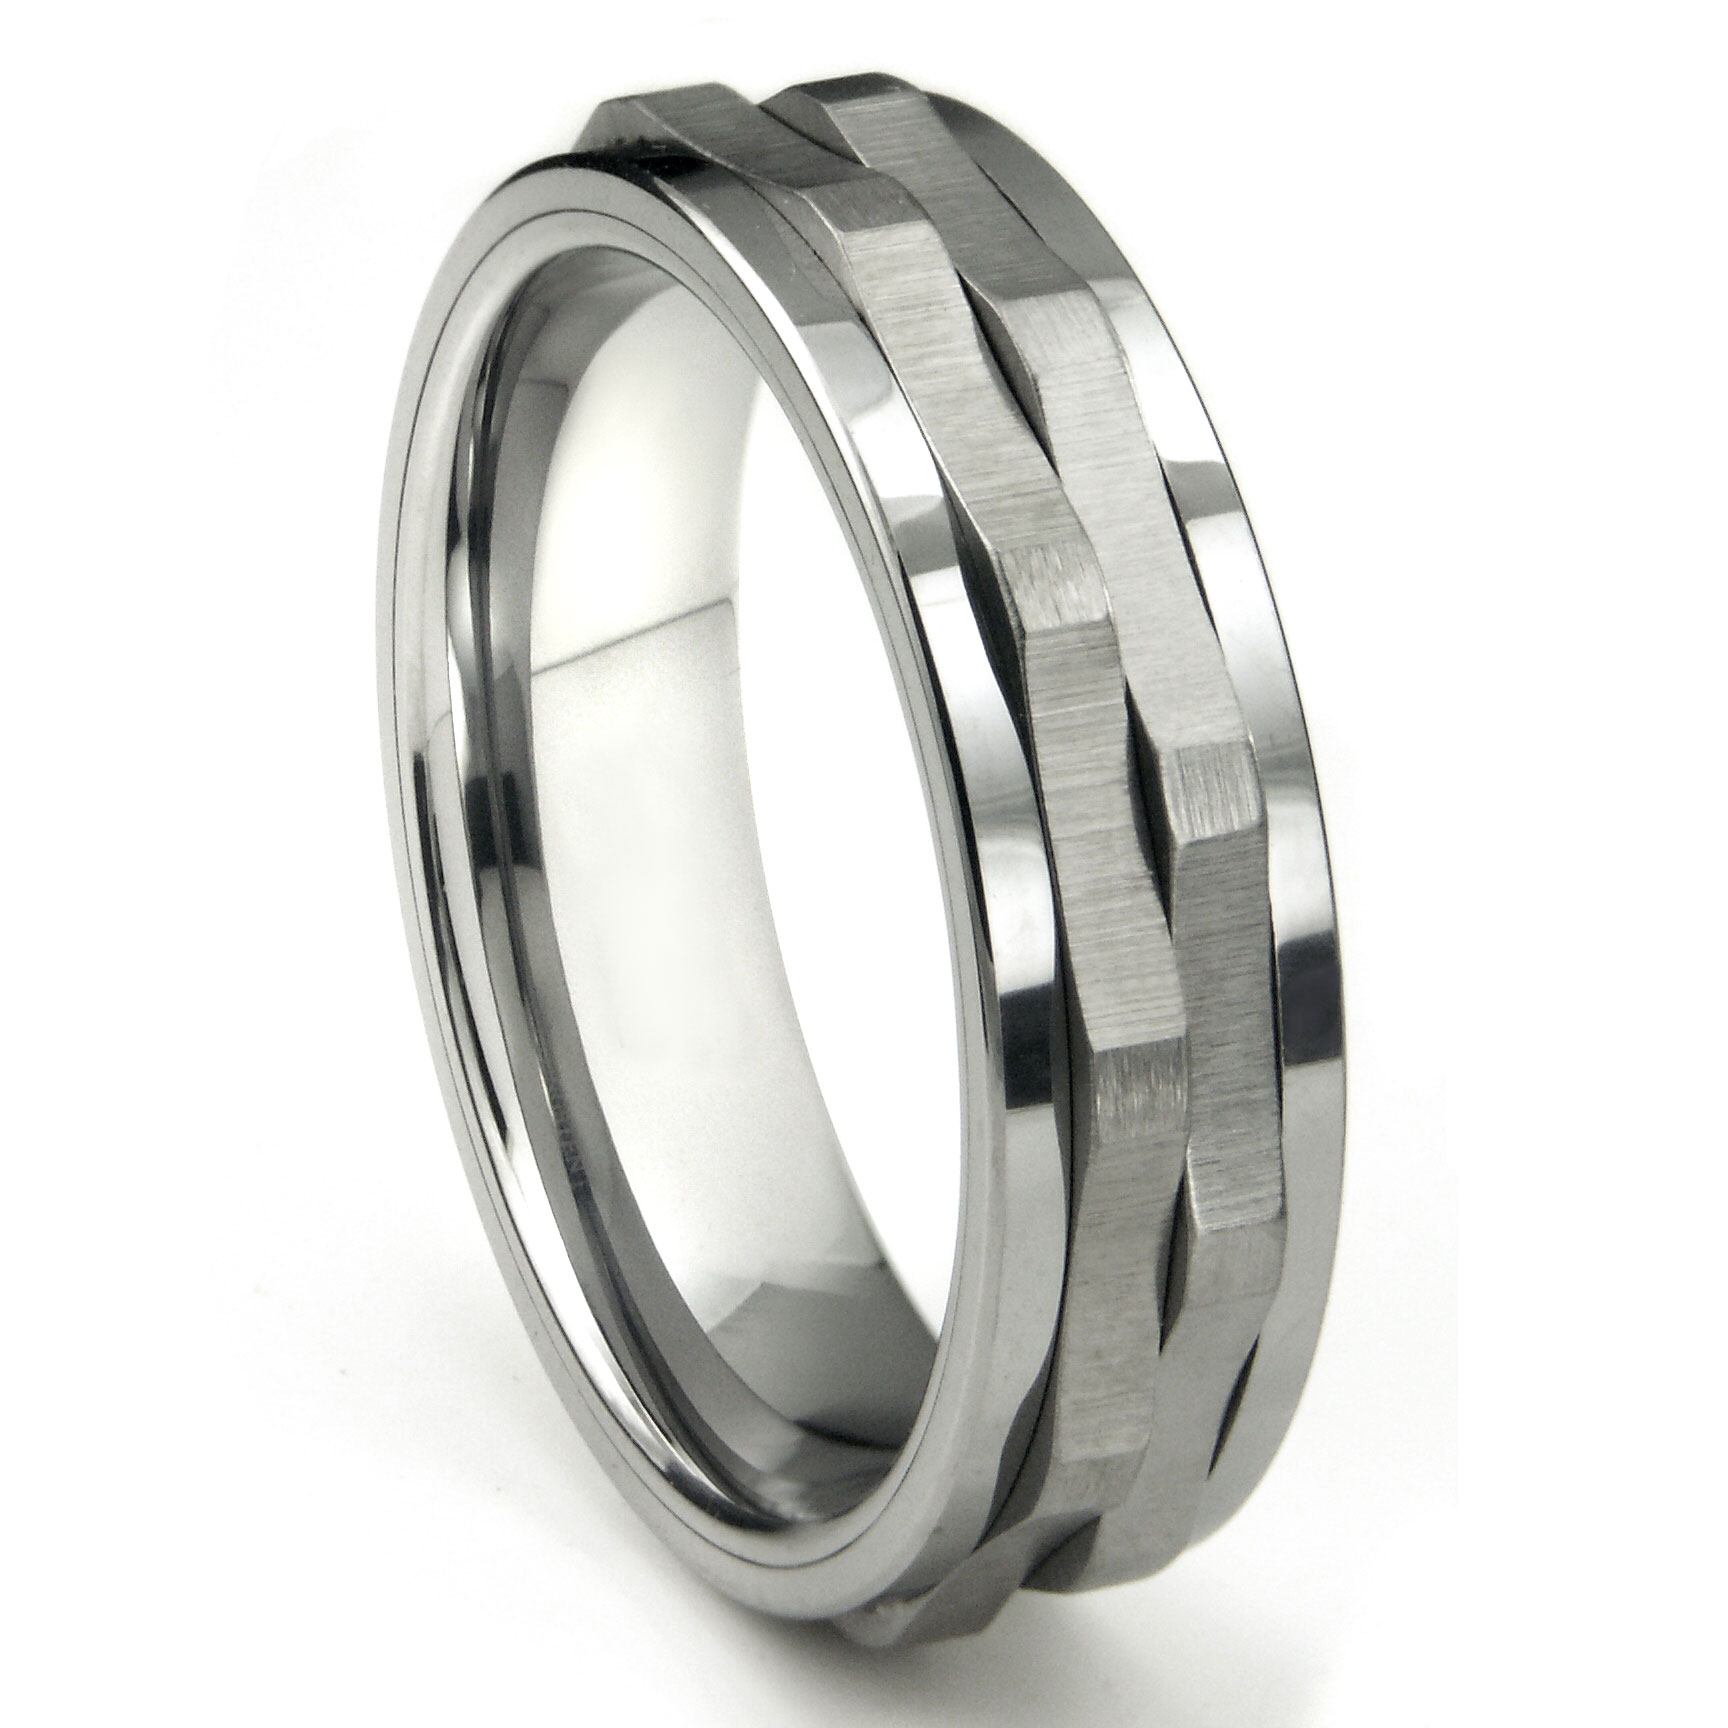 Ninja Star Tungsten Carbide Spinning Wedding Band Ring P tungsten carbide wedding rings Home Men s Tungsten Carbide Rings Loading zoom